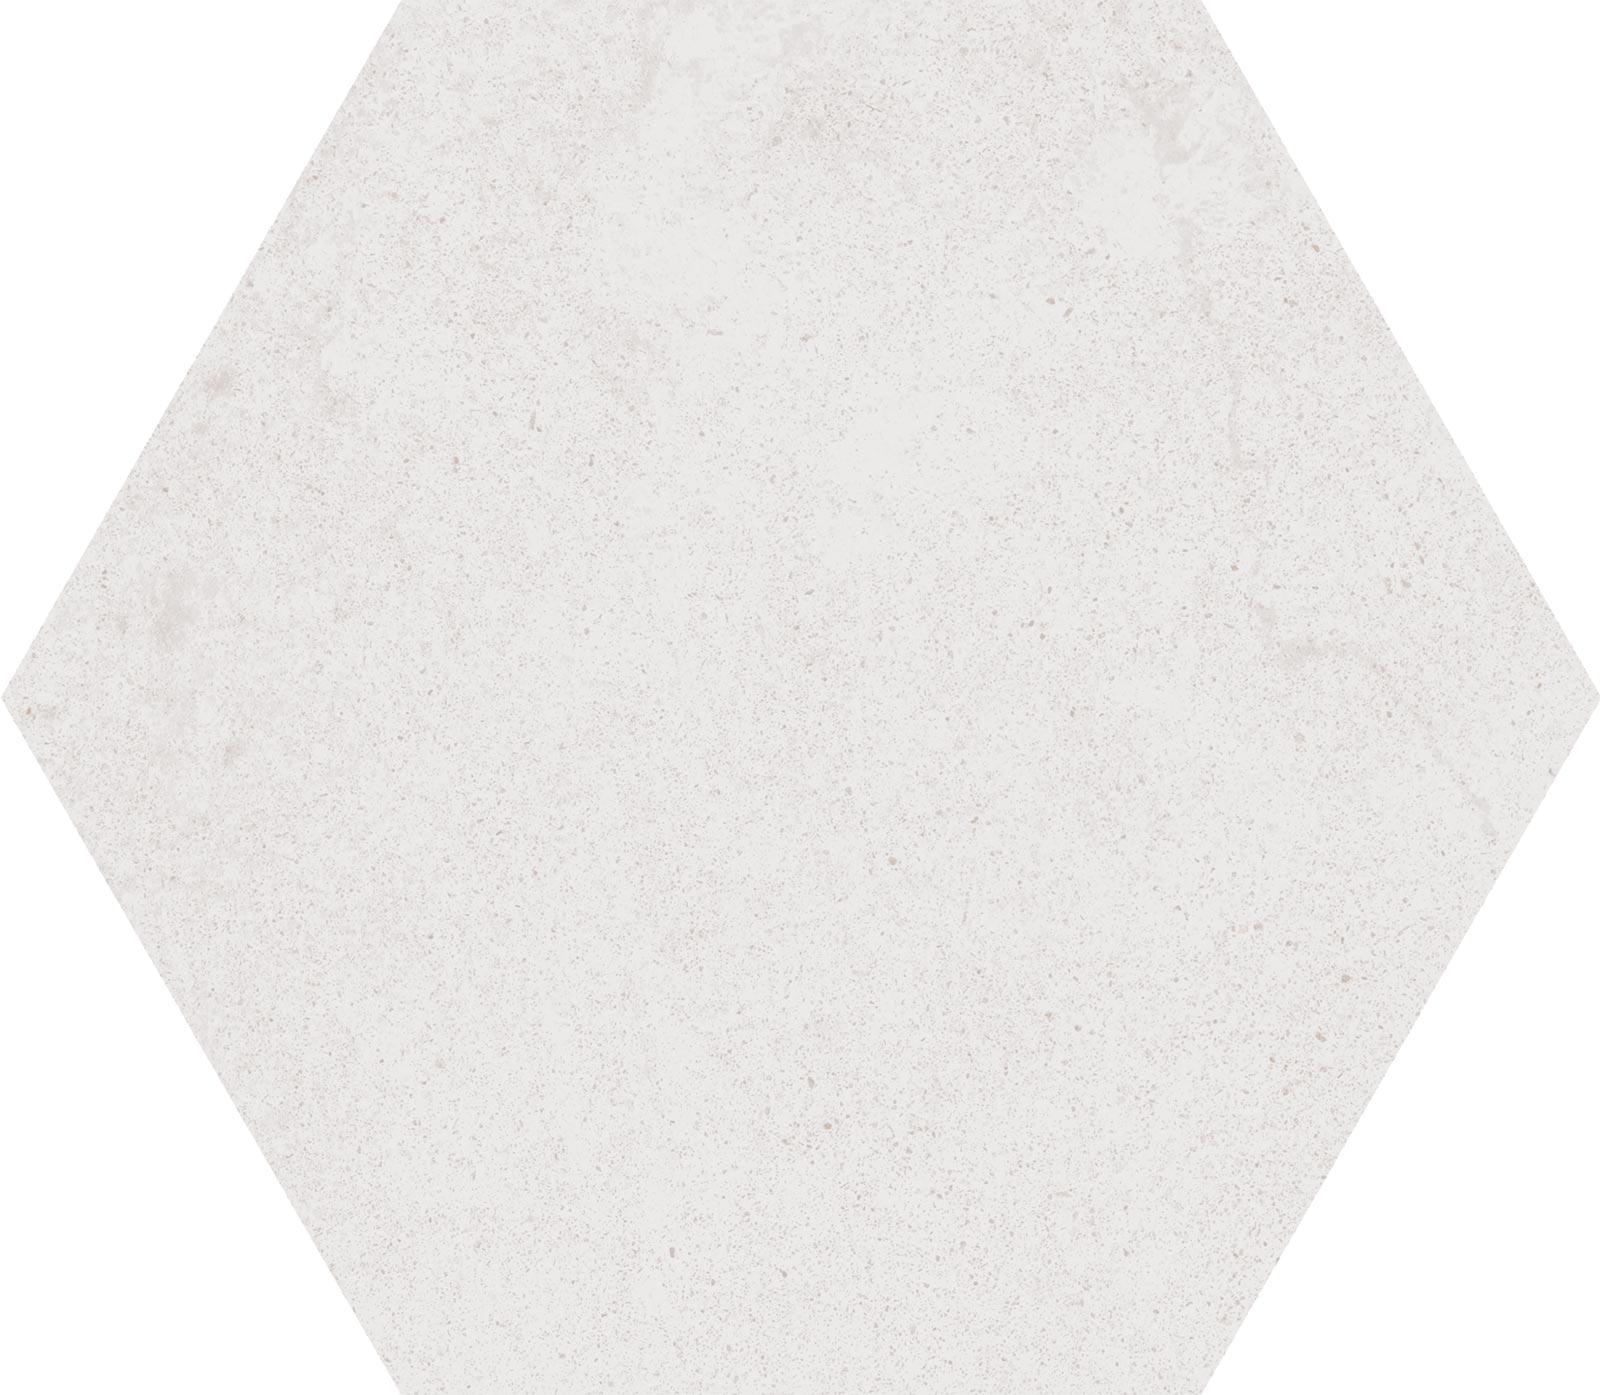 HEX. SIXTONE WHITE 19,8X22,8